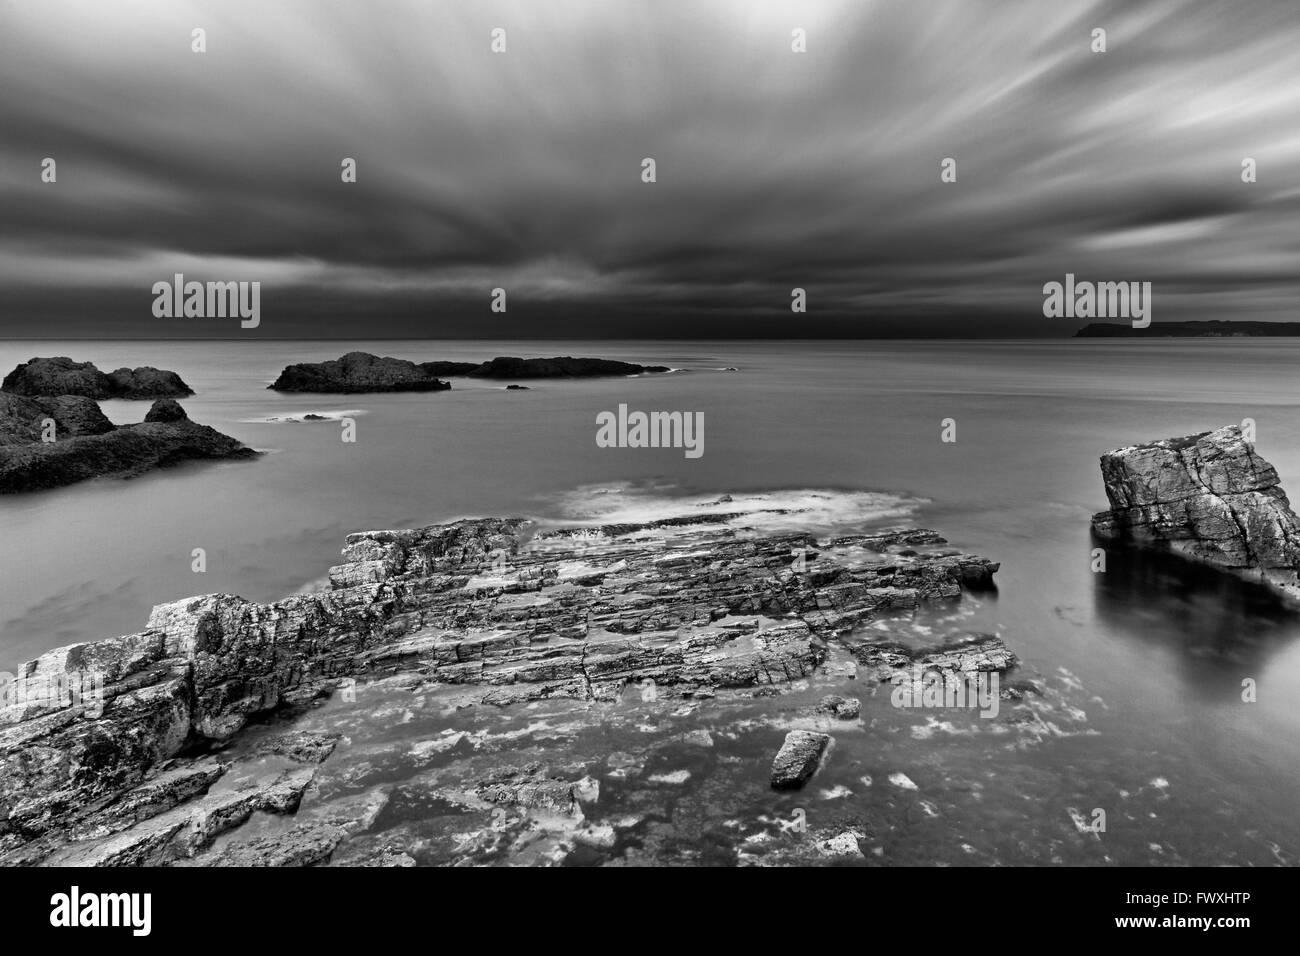 Ballintoy Harbour, Ballintoy Village, County Antrim, Ulster, Northern Ireland, Europe - Stock Image